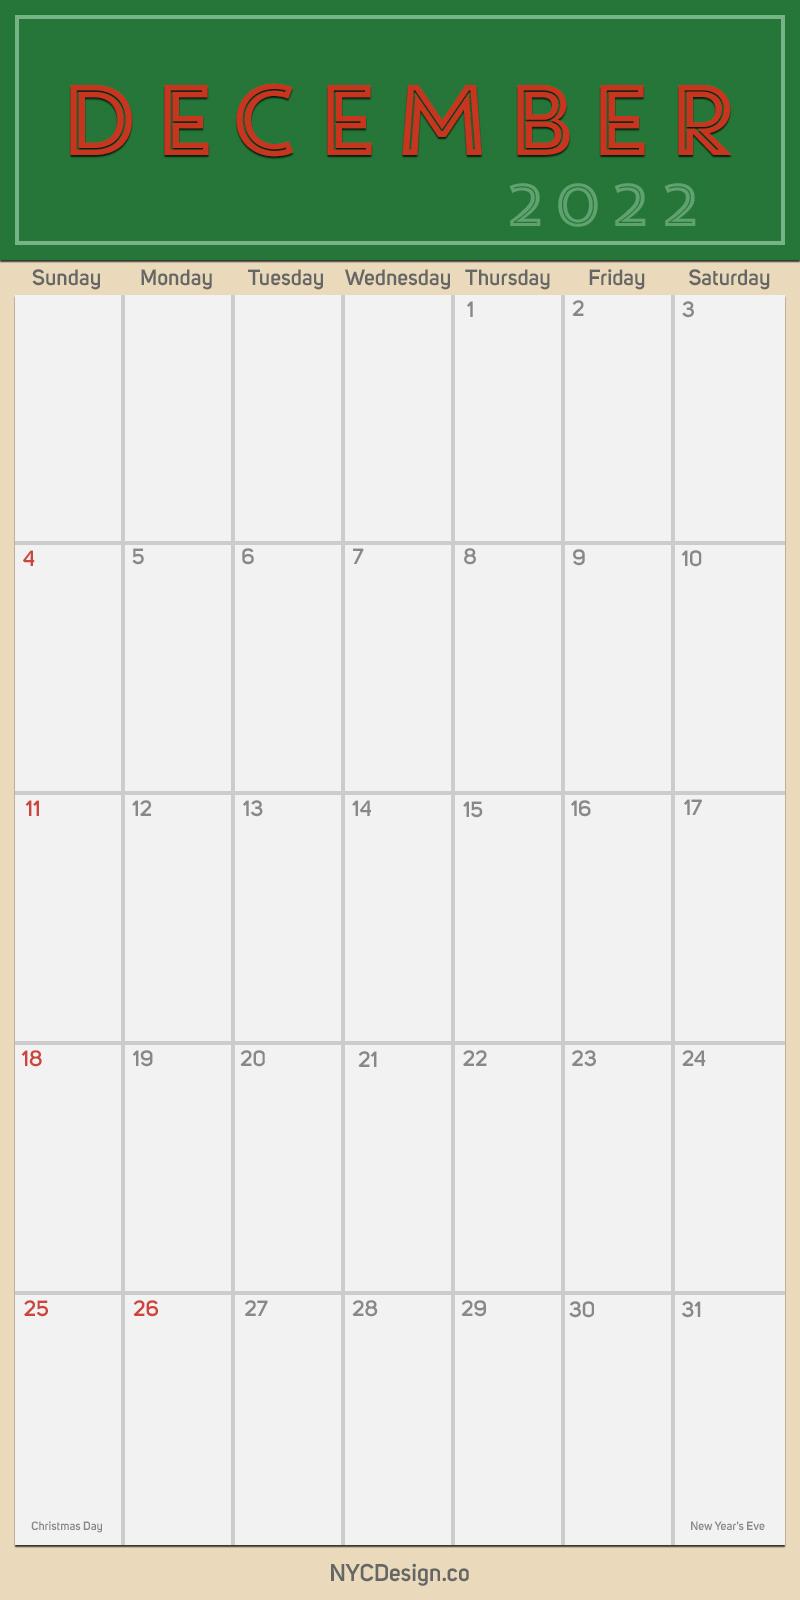 2022 December - Monthly Calendar, Planner, Printable Free ...